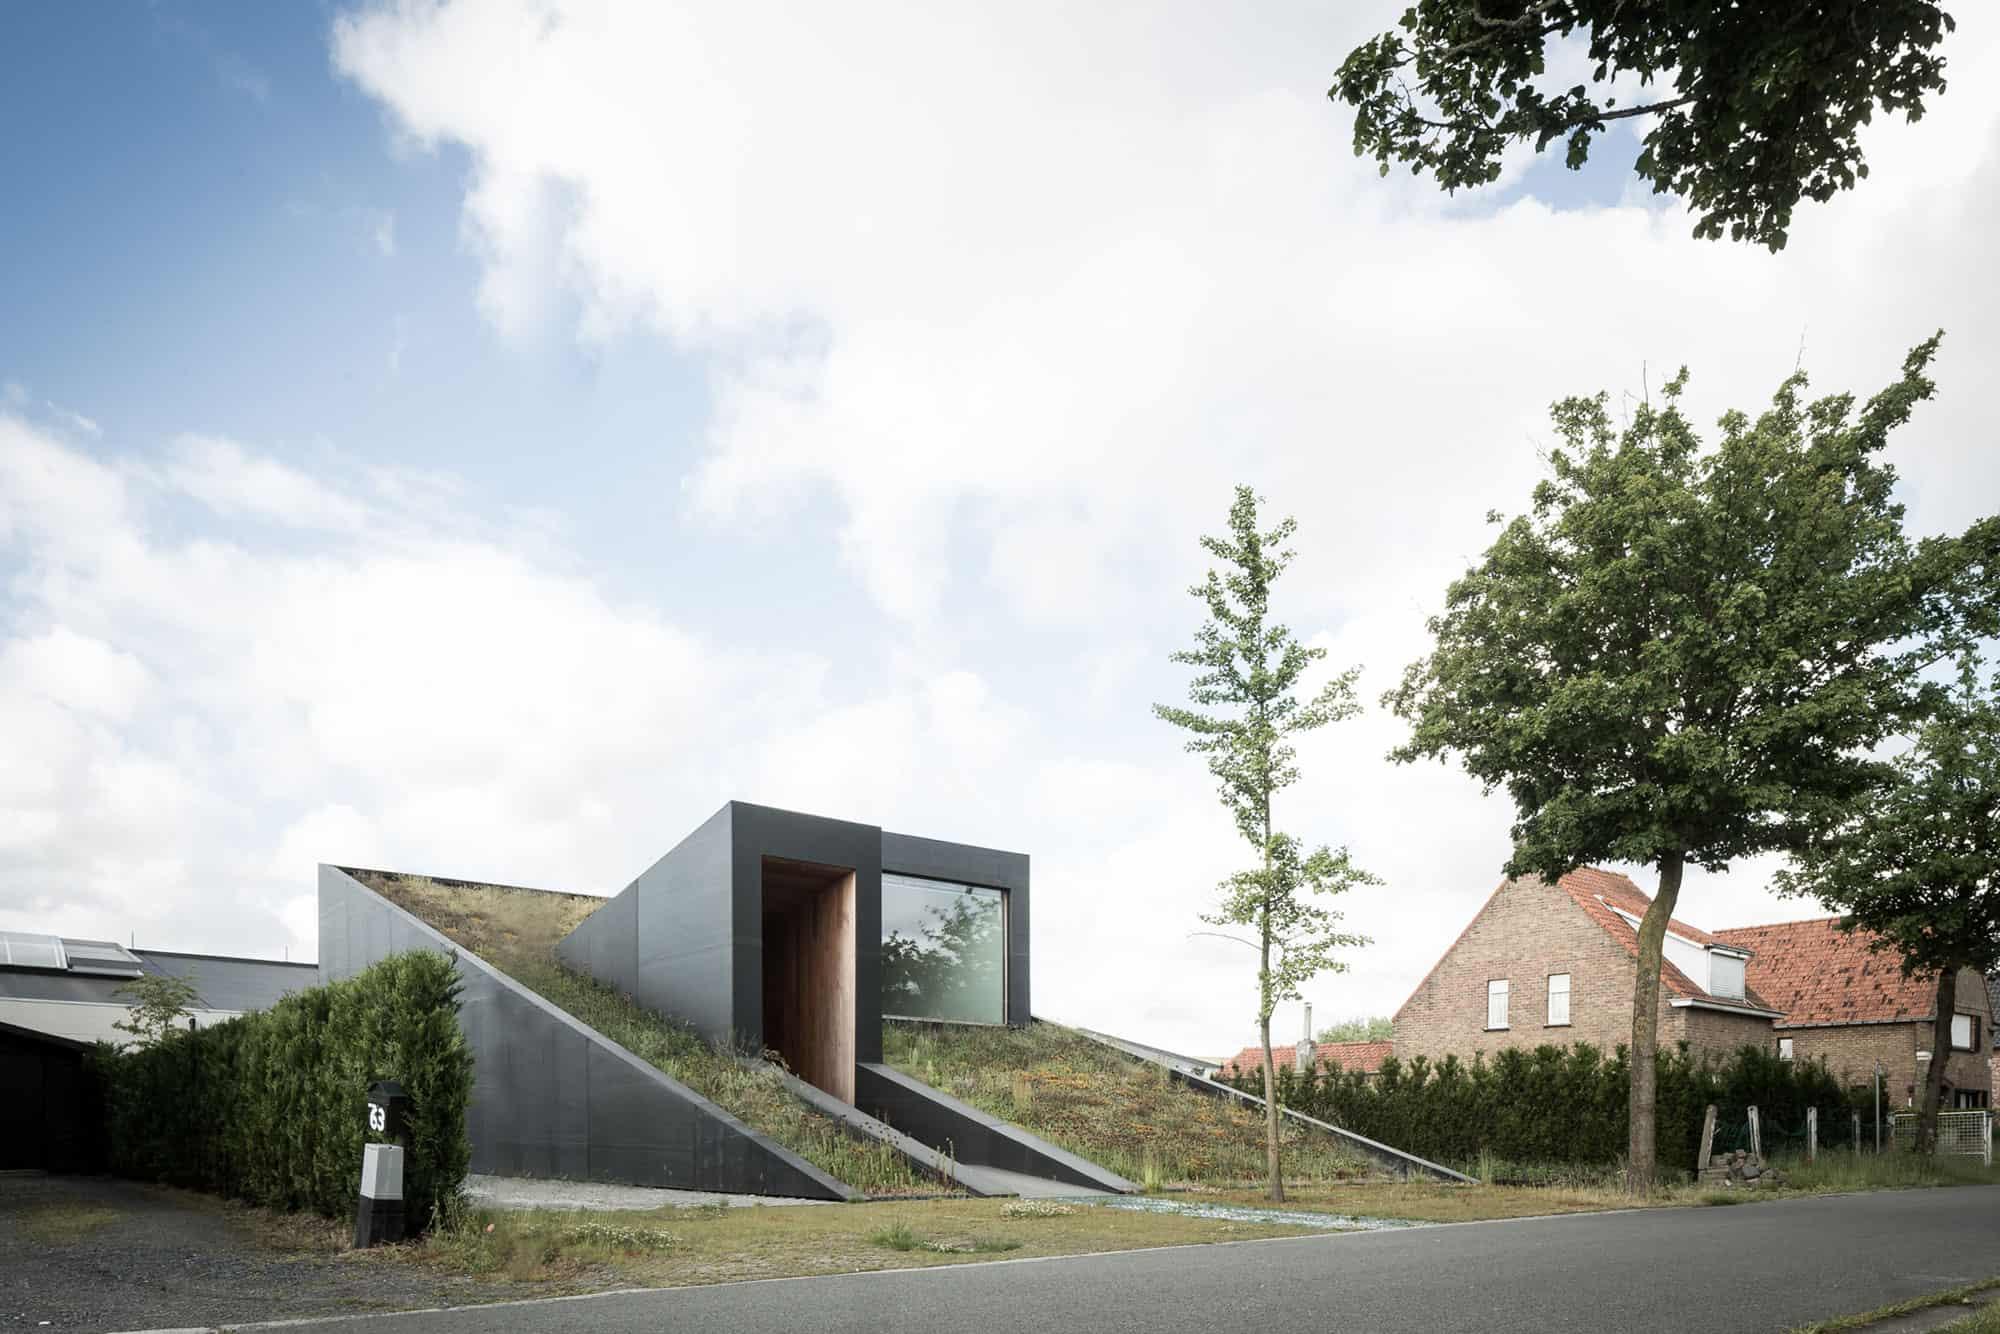 OYO Designs a Unique Private Home in Maldegem, Belgium